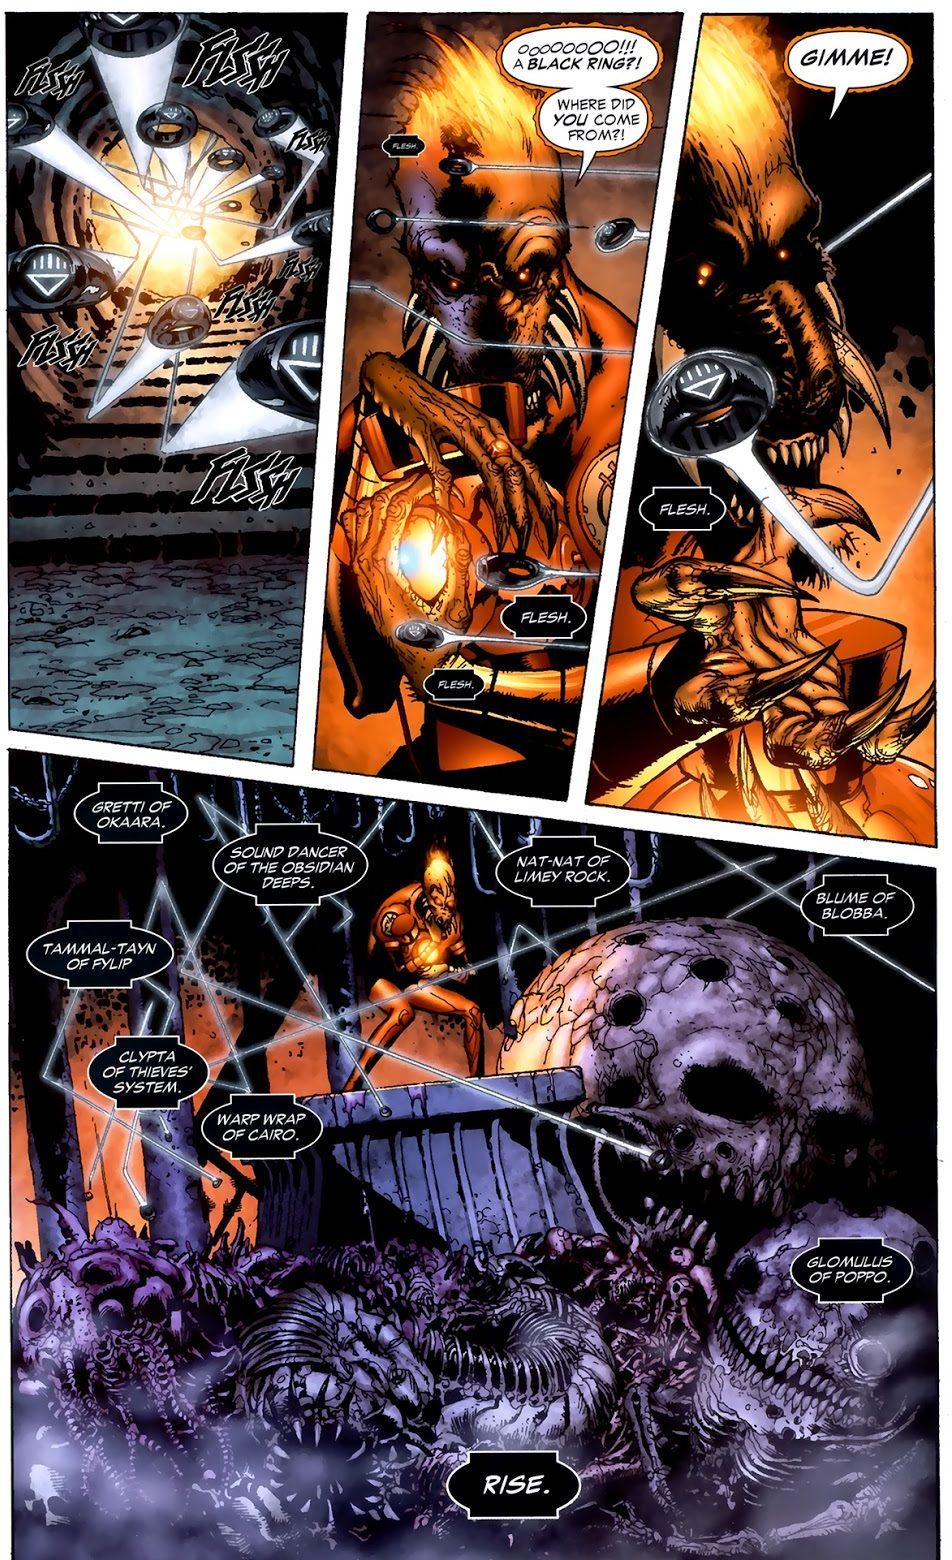 Agent Orange Larfleeze (Green Lantern Vol. 4 #45)